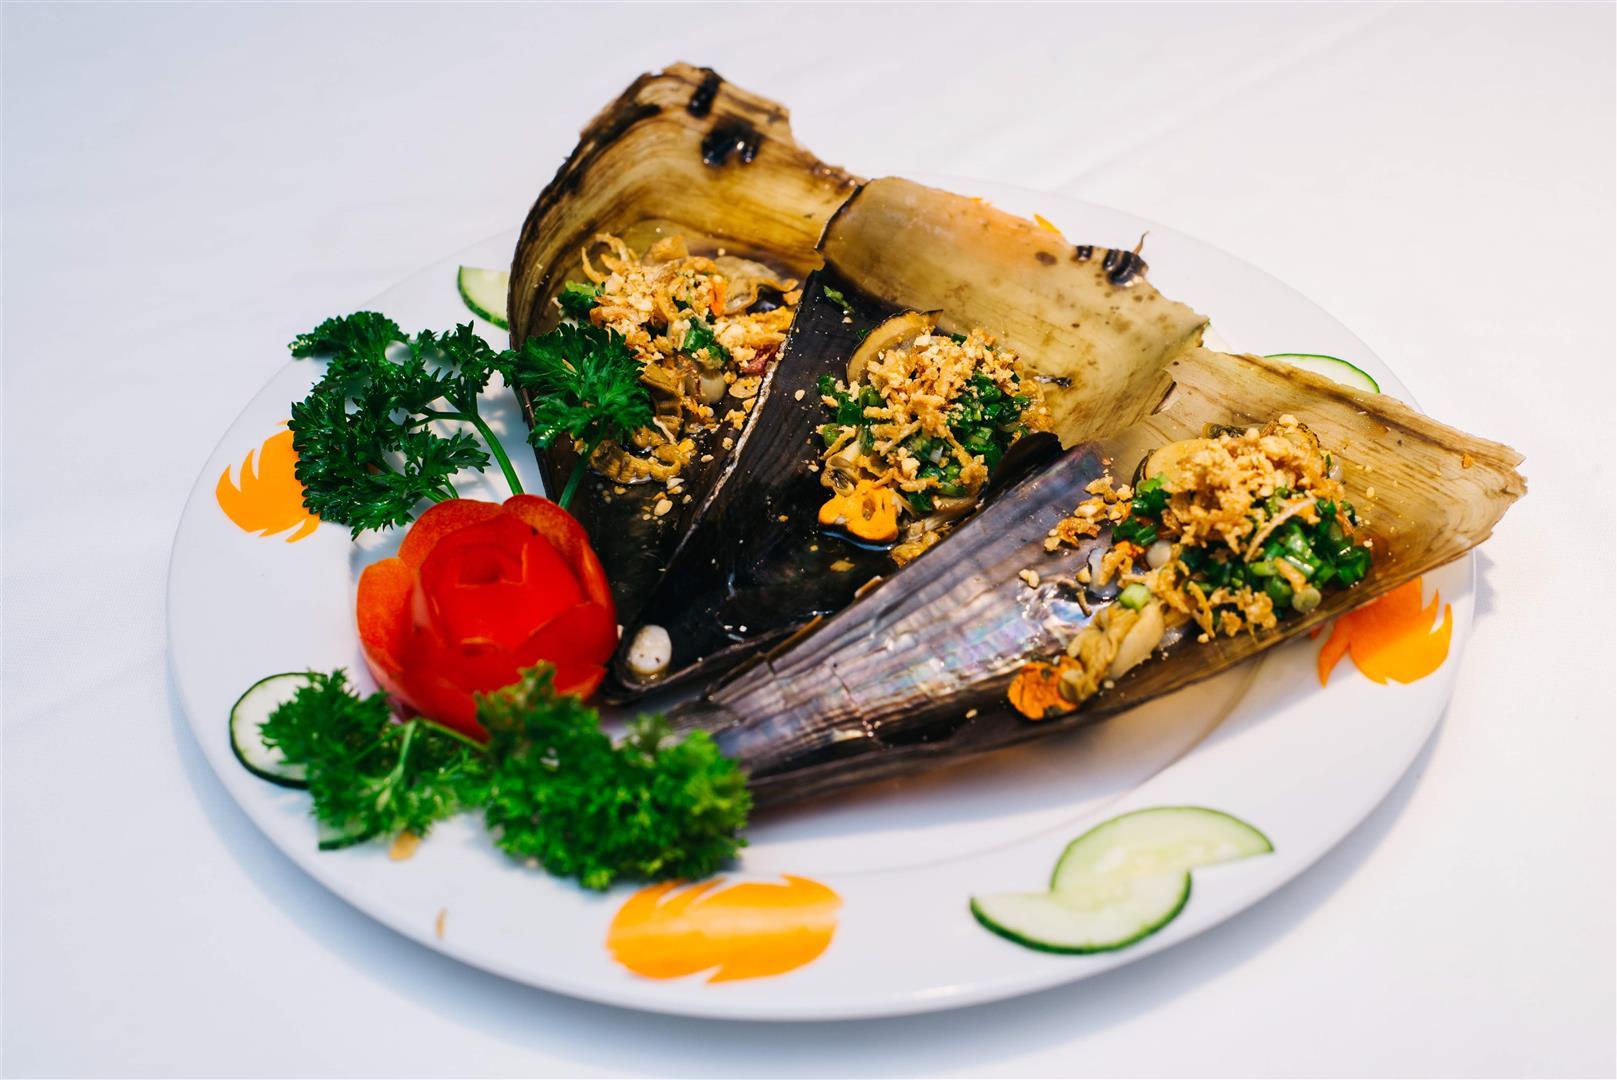 Sò Mai Nướng Mỡ Hành / Seashell Grilled with onion and oil